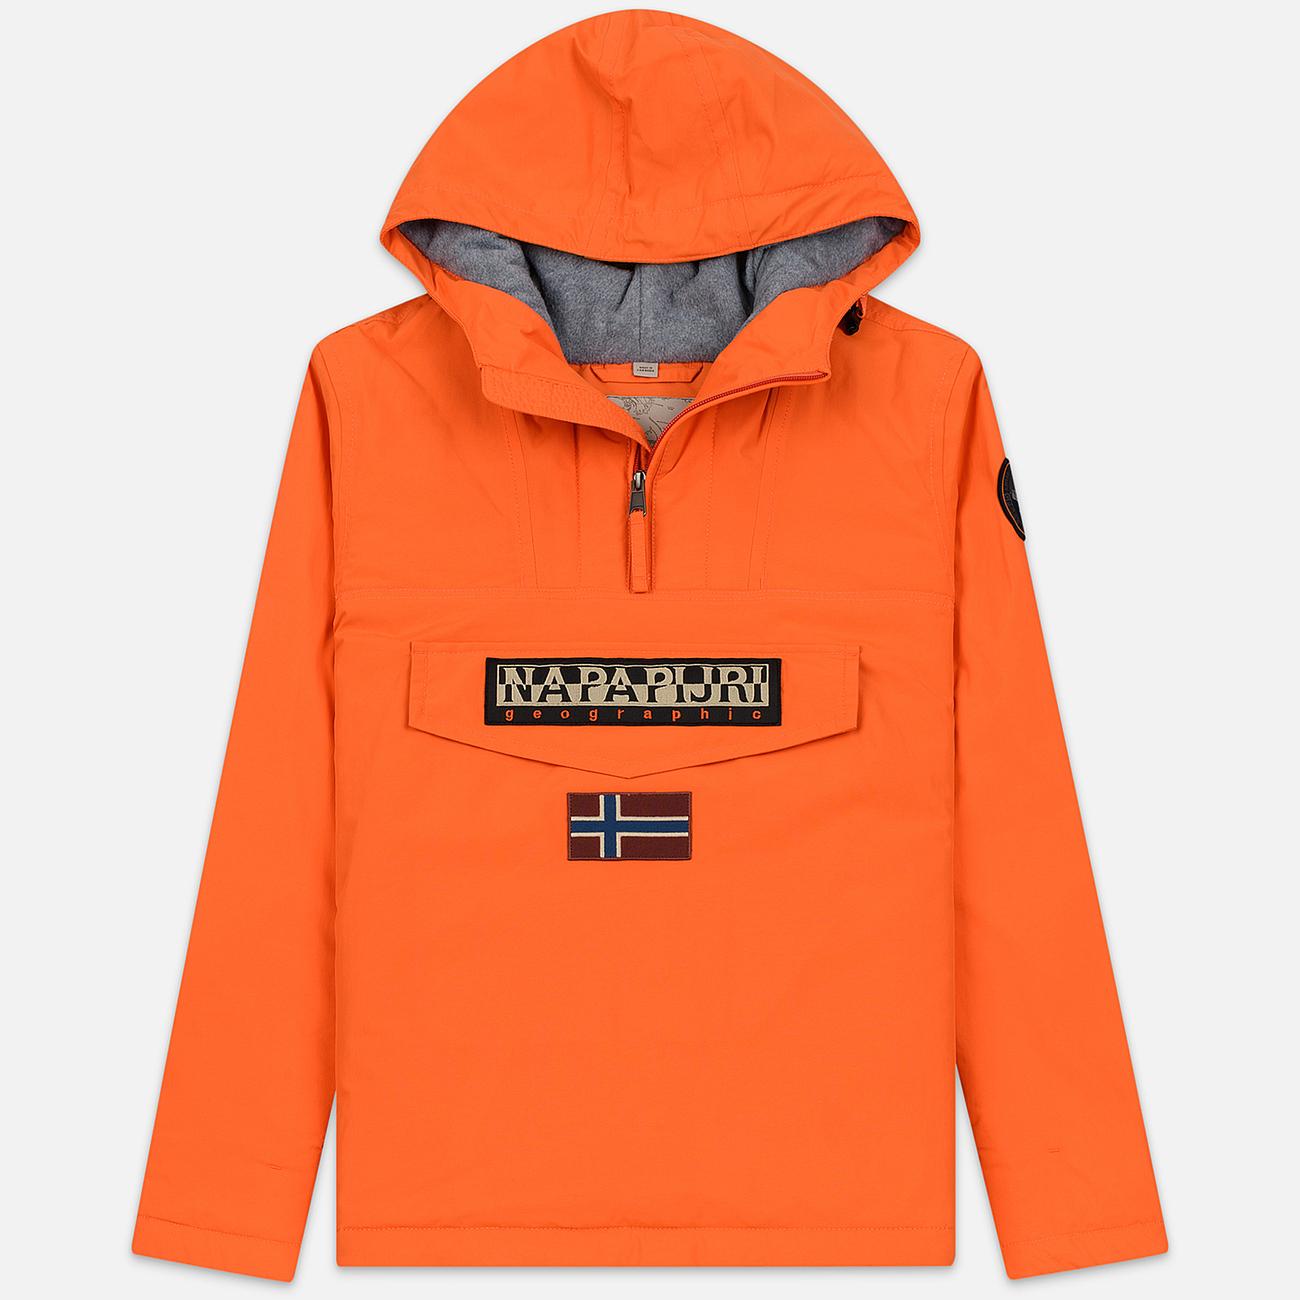 Мужская куртка анорак Napapijri Rainforest Winter Orange Puffin